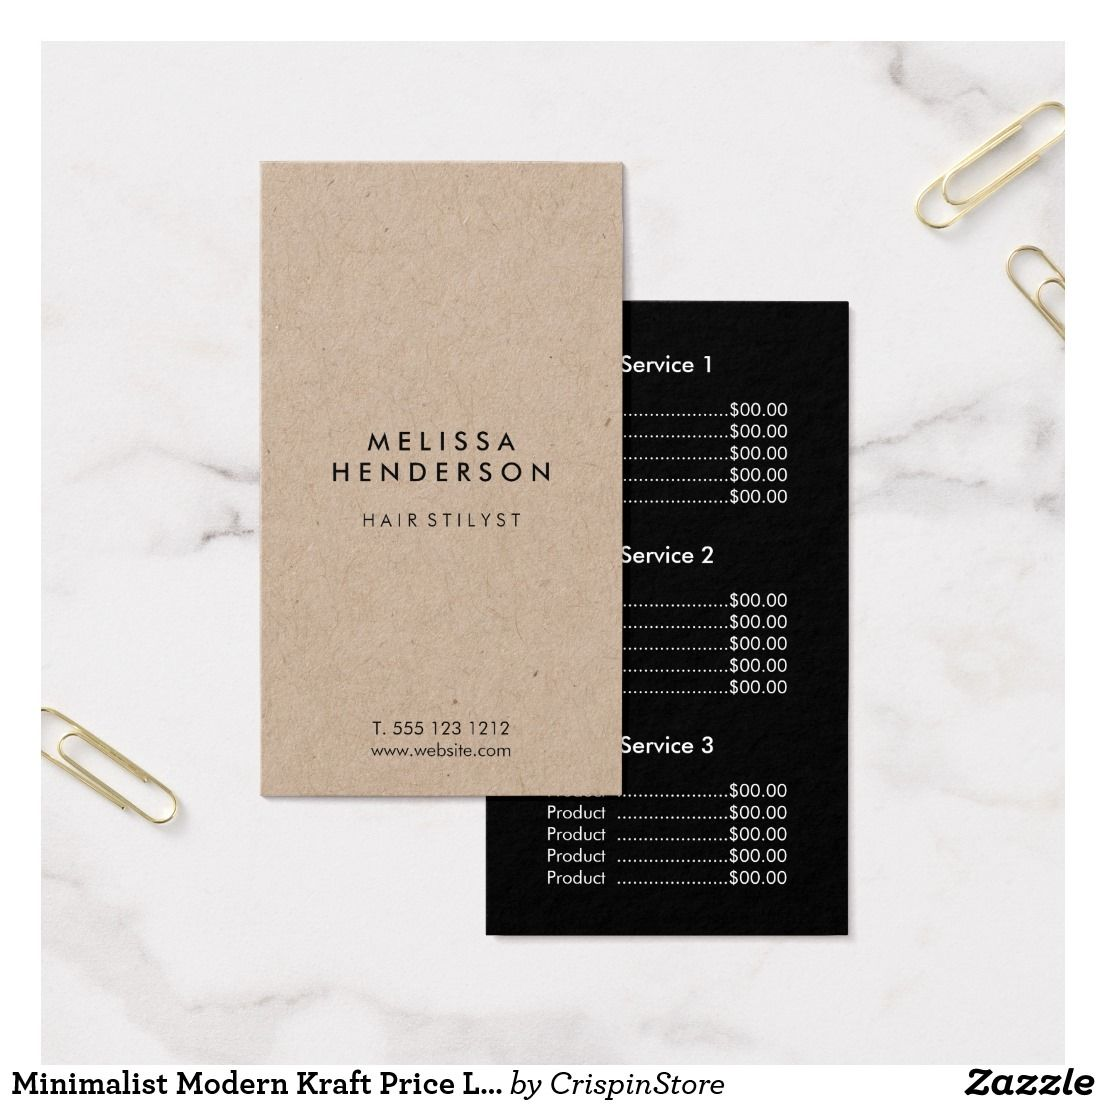 Minimalist Modern Kraft Price List Business Card Zazzle Com